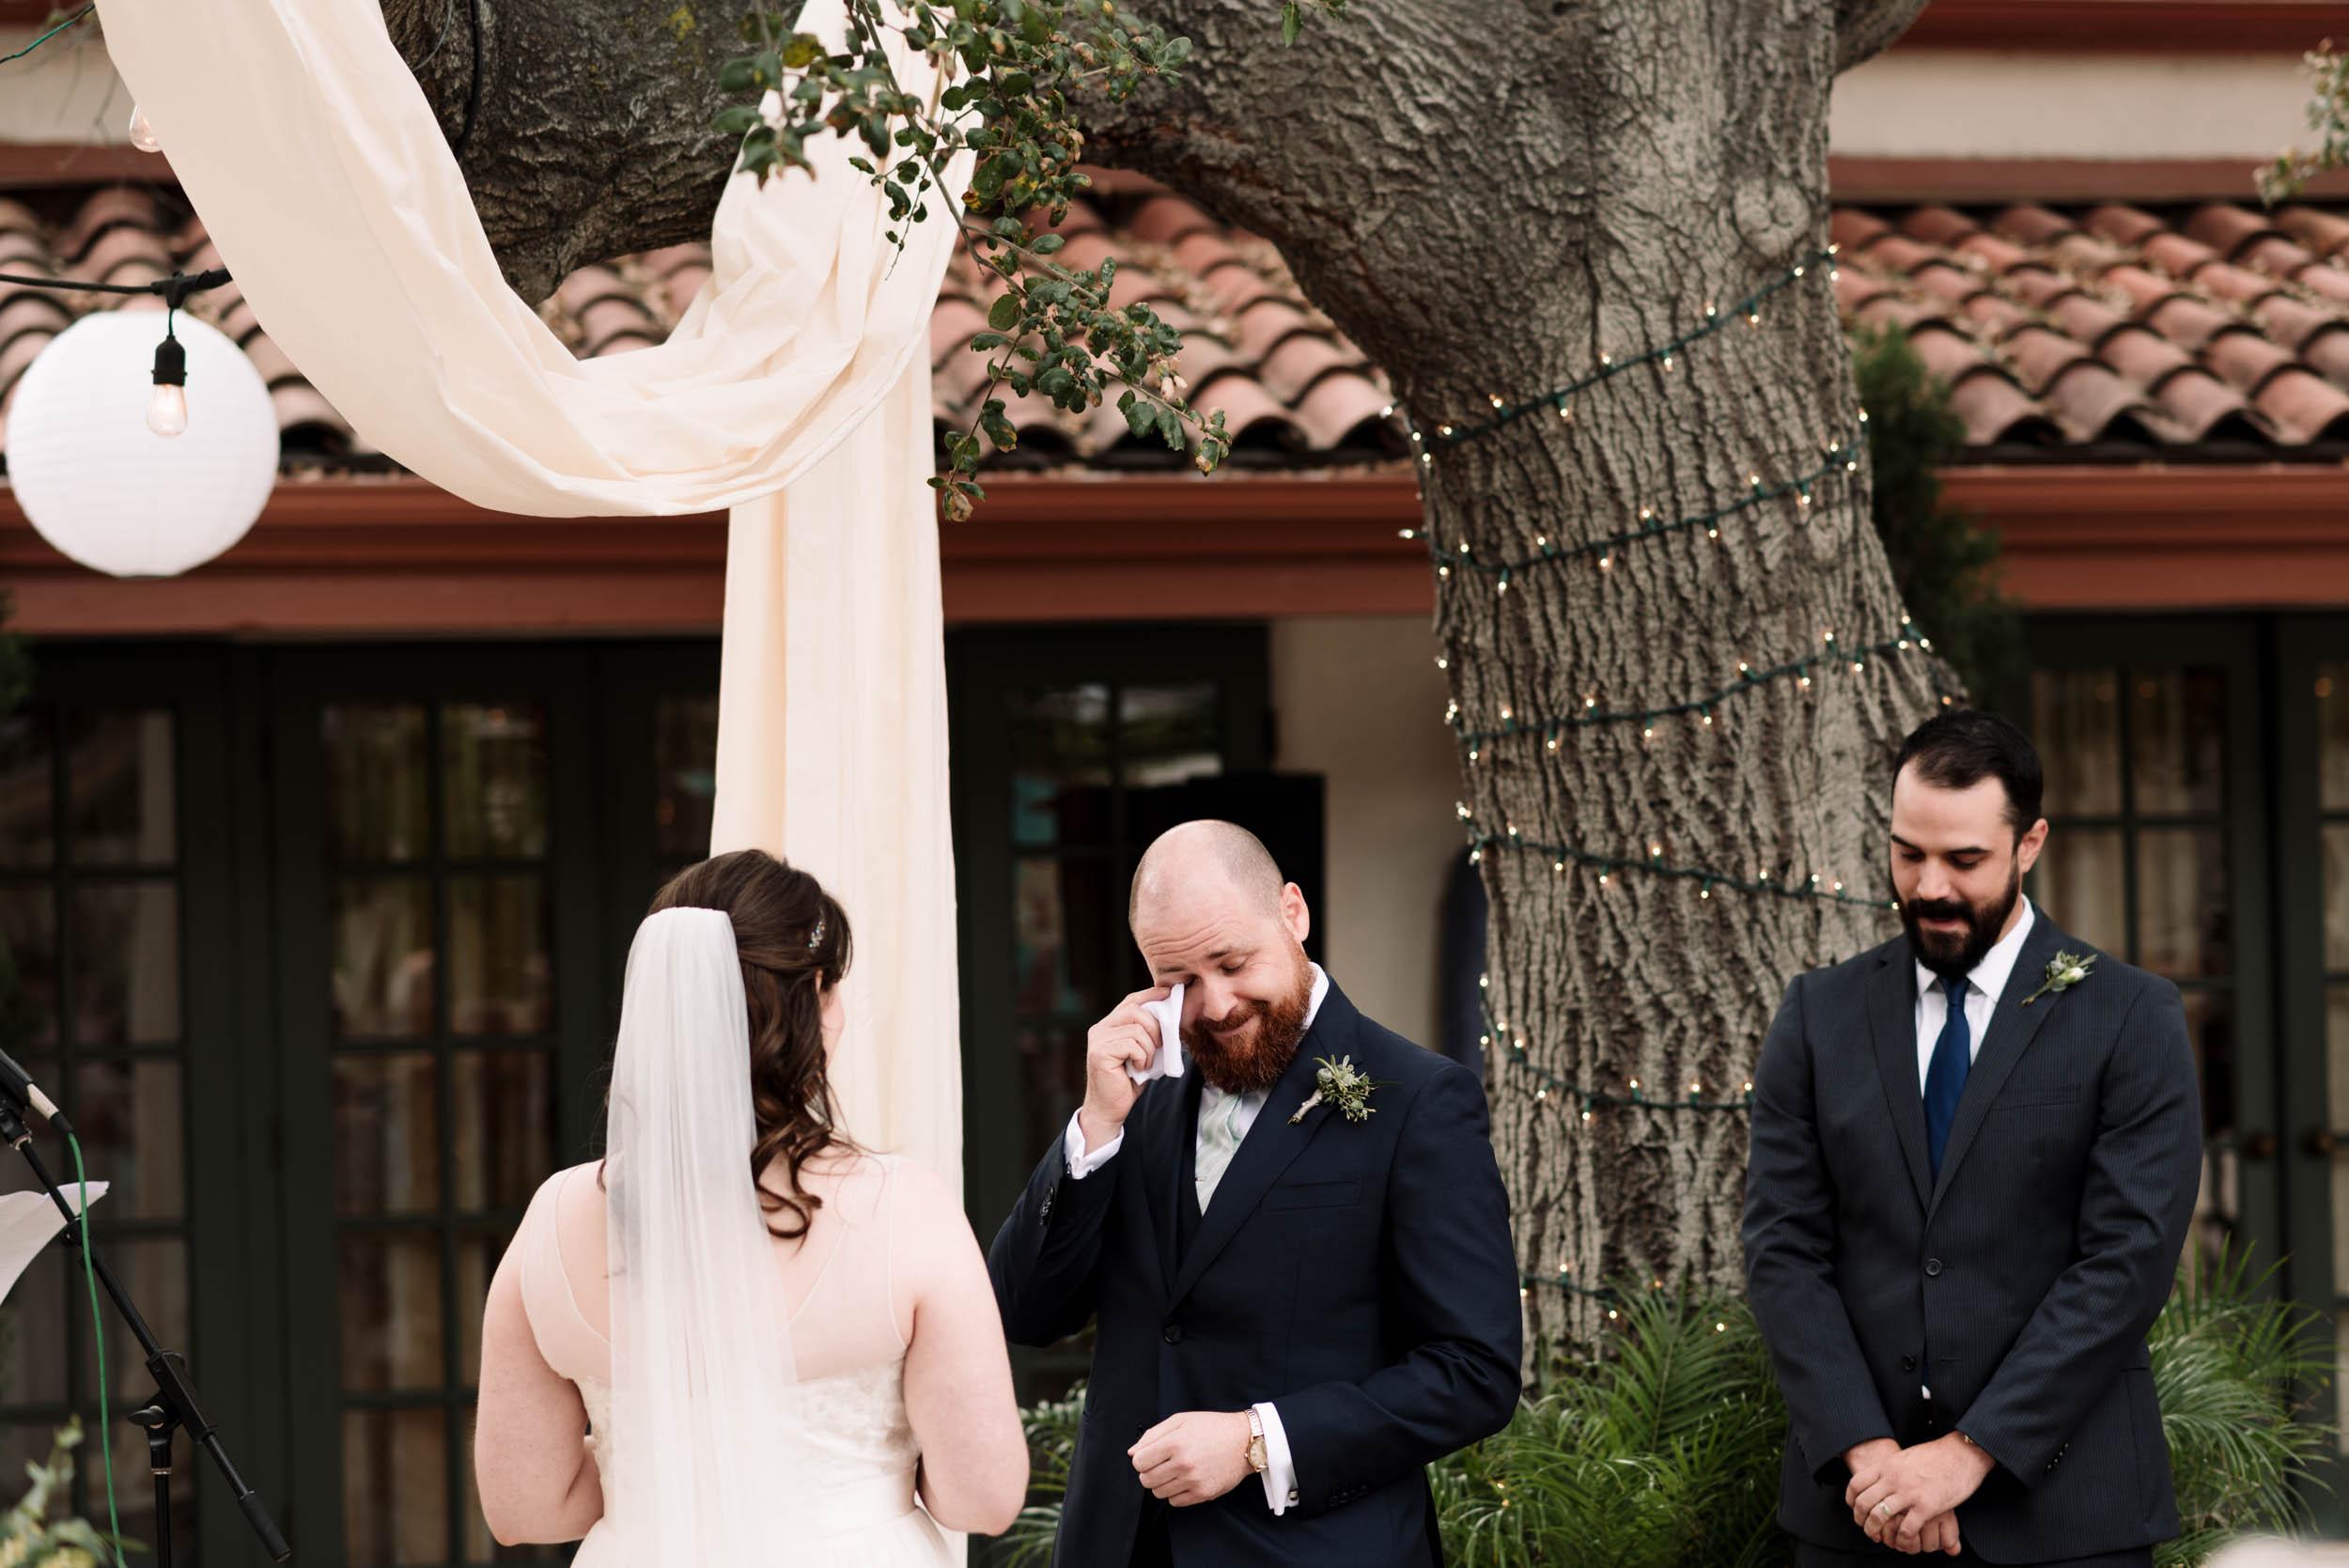 Desination_Wedding_Los Angeles-14.jpg